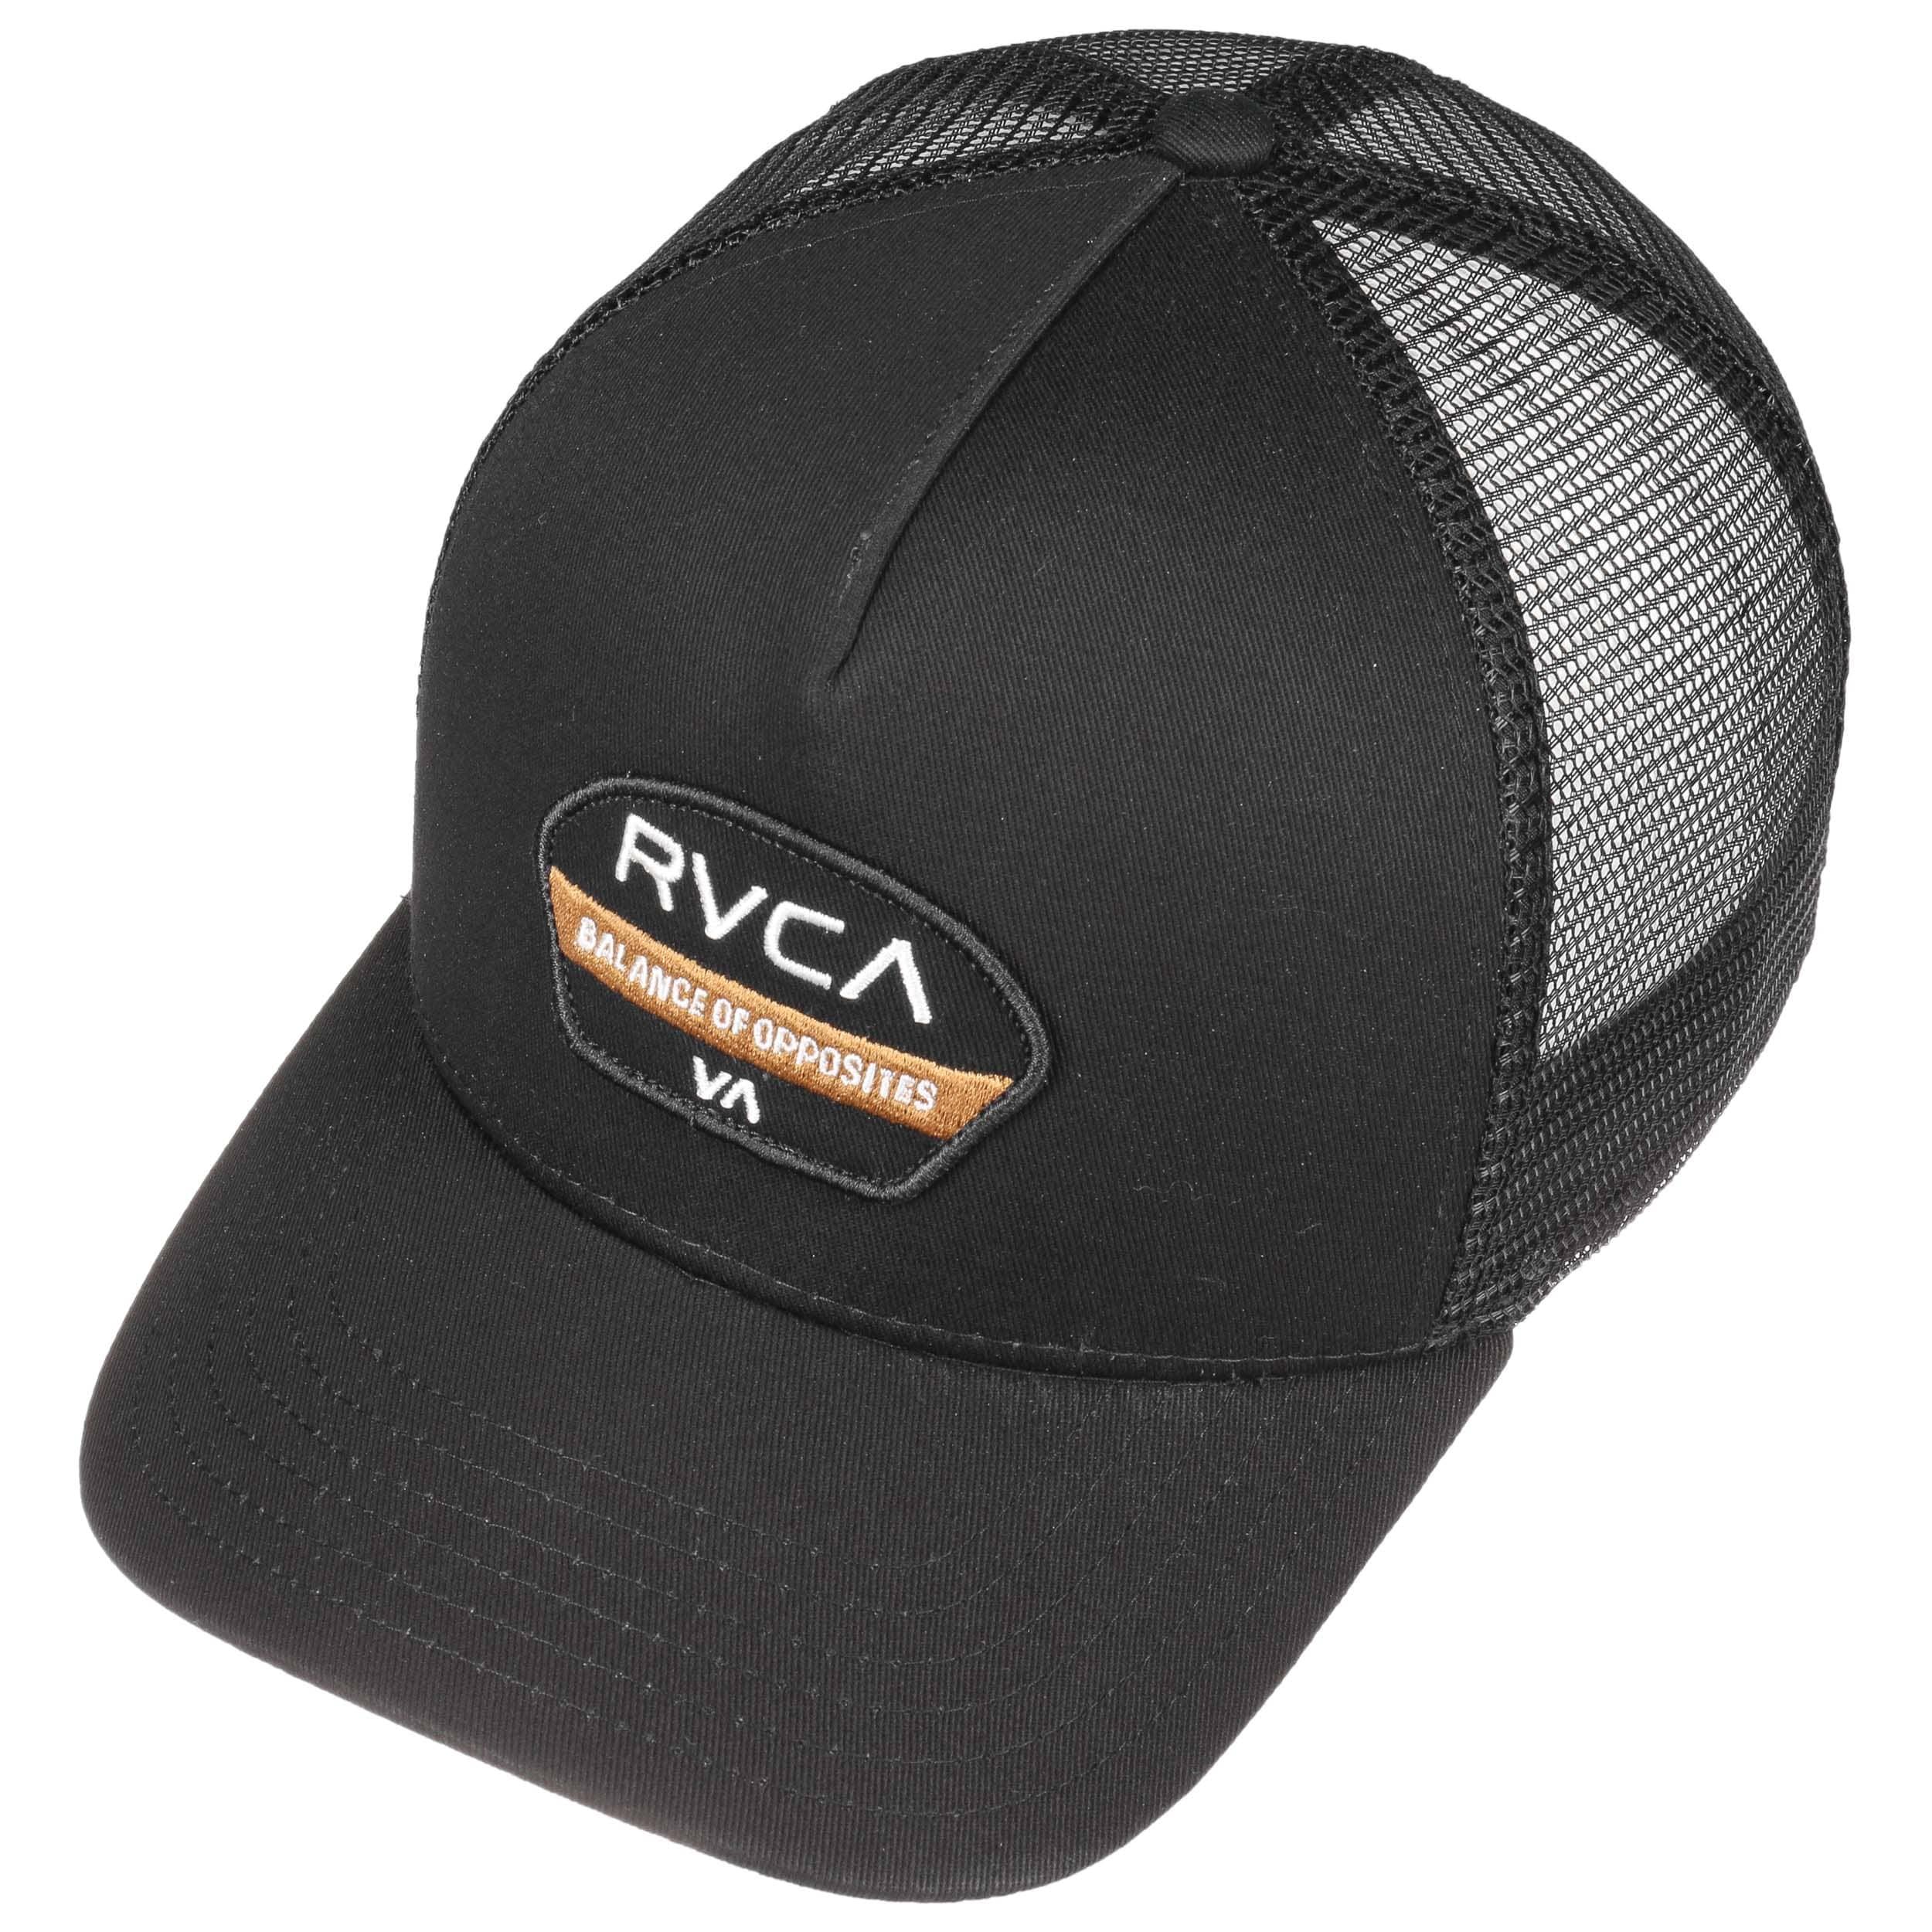 7b66602b03b42 ... real balance of opposites trucker cap by rvca black 1 f2ebd ee024 get rvca  balance patch ...